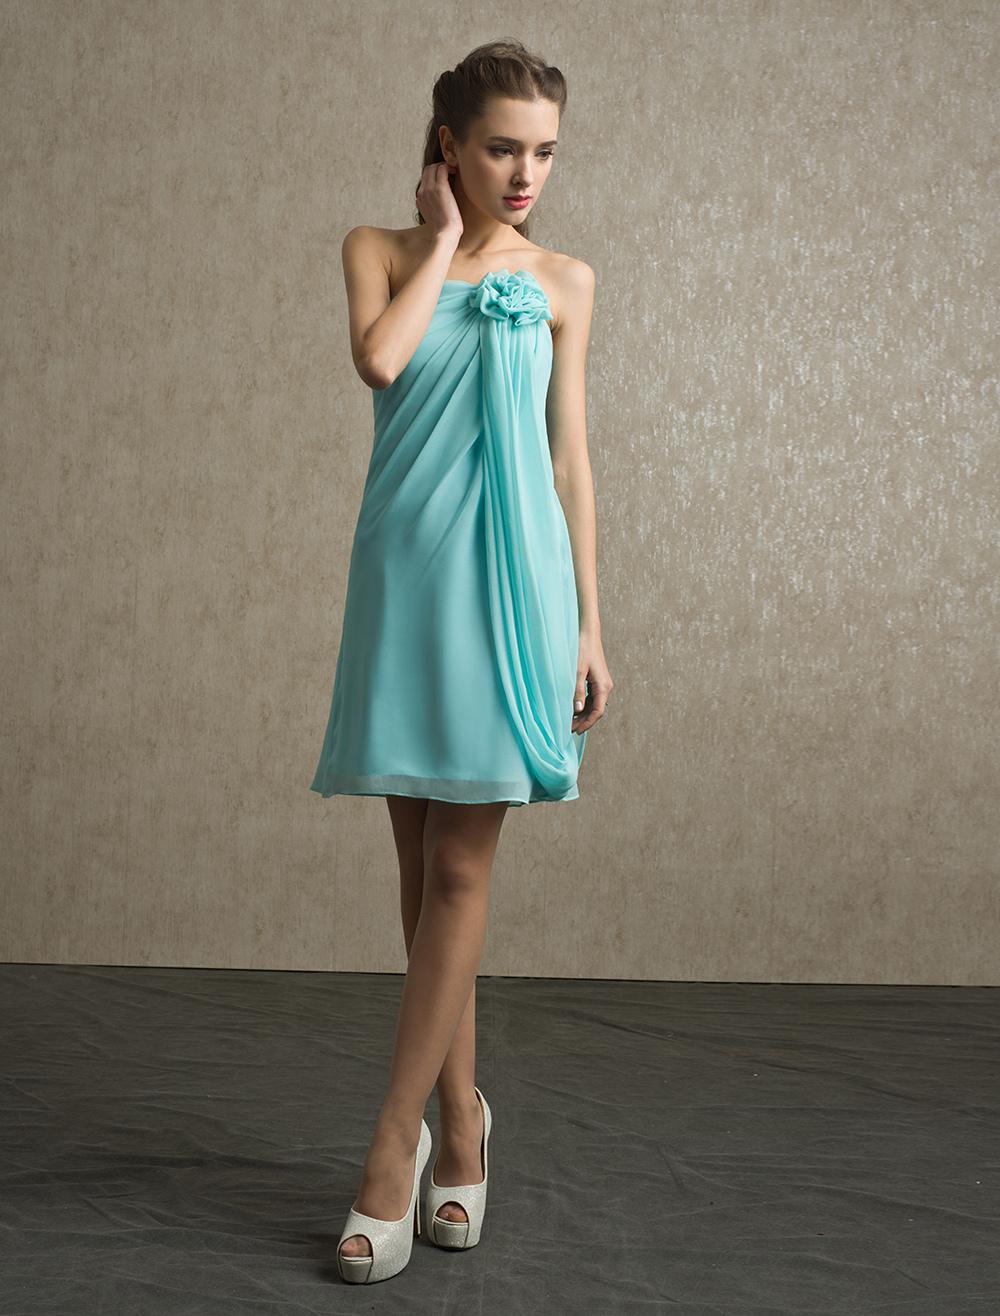 Flower Chiffon A-line Strapless Bridesmaid Dress with Elegant Knee-Length Skirt